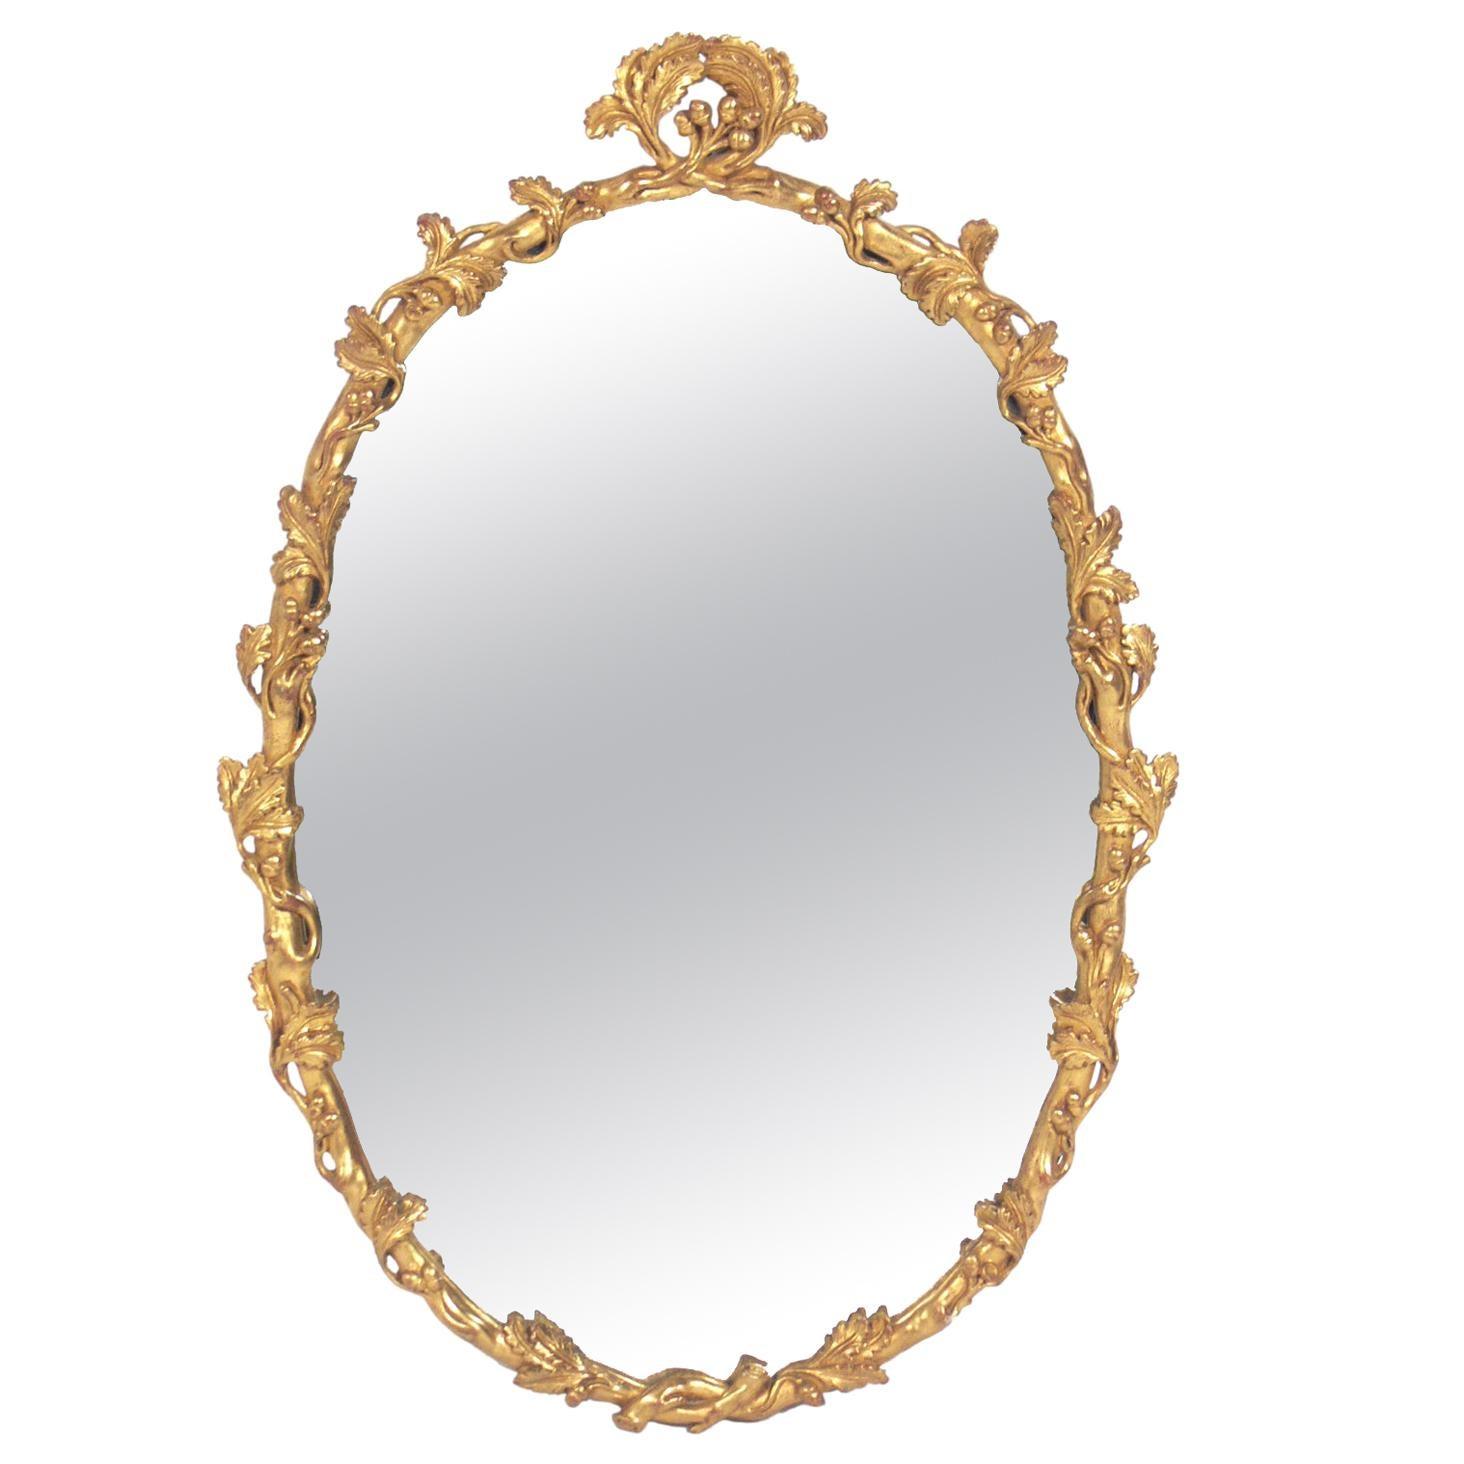 Gold Leaf Branches Mirror